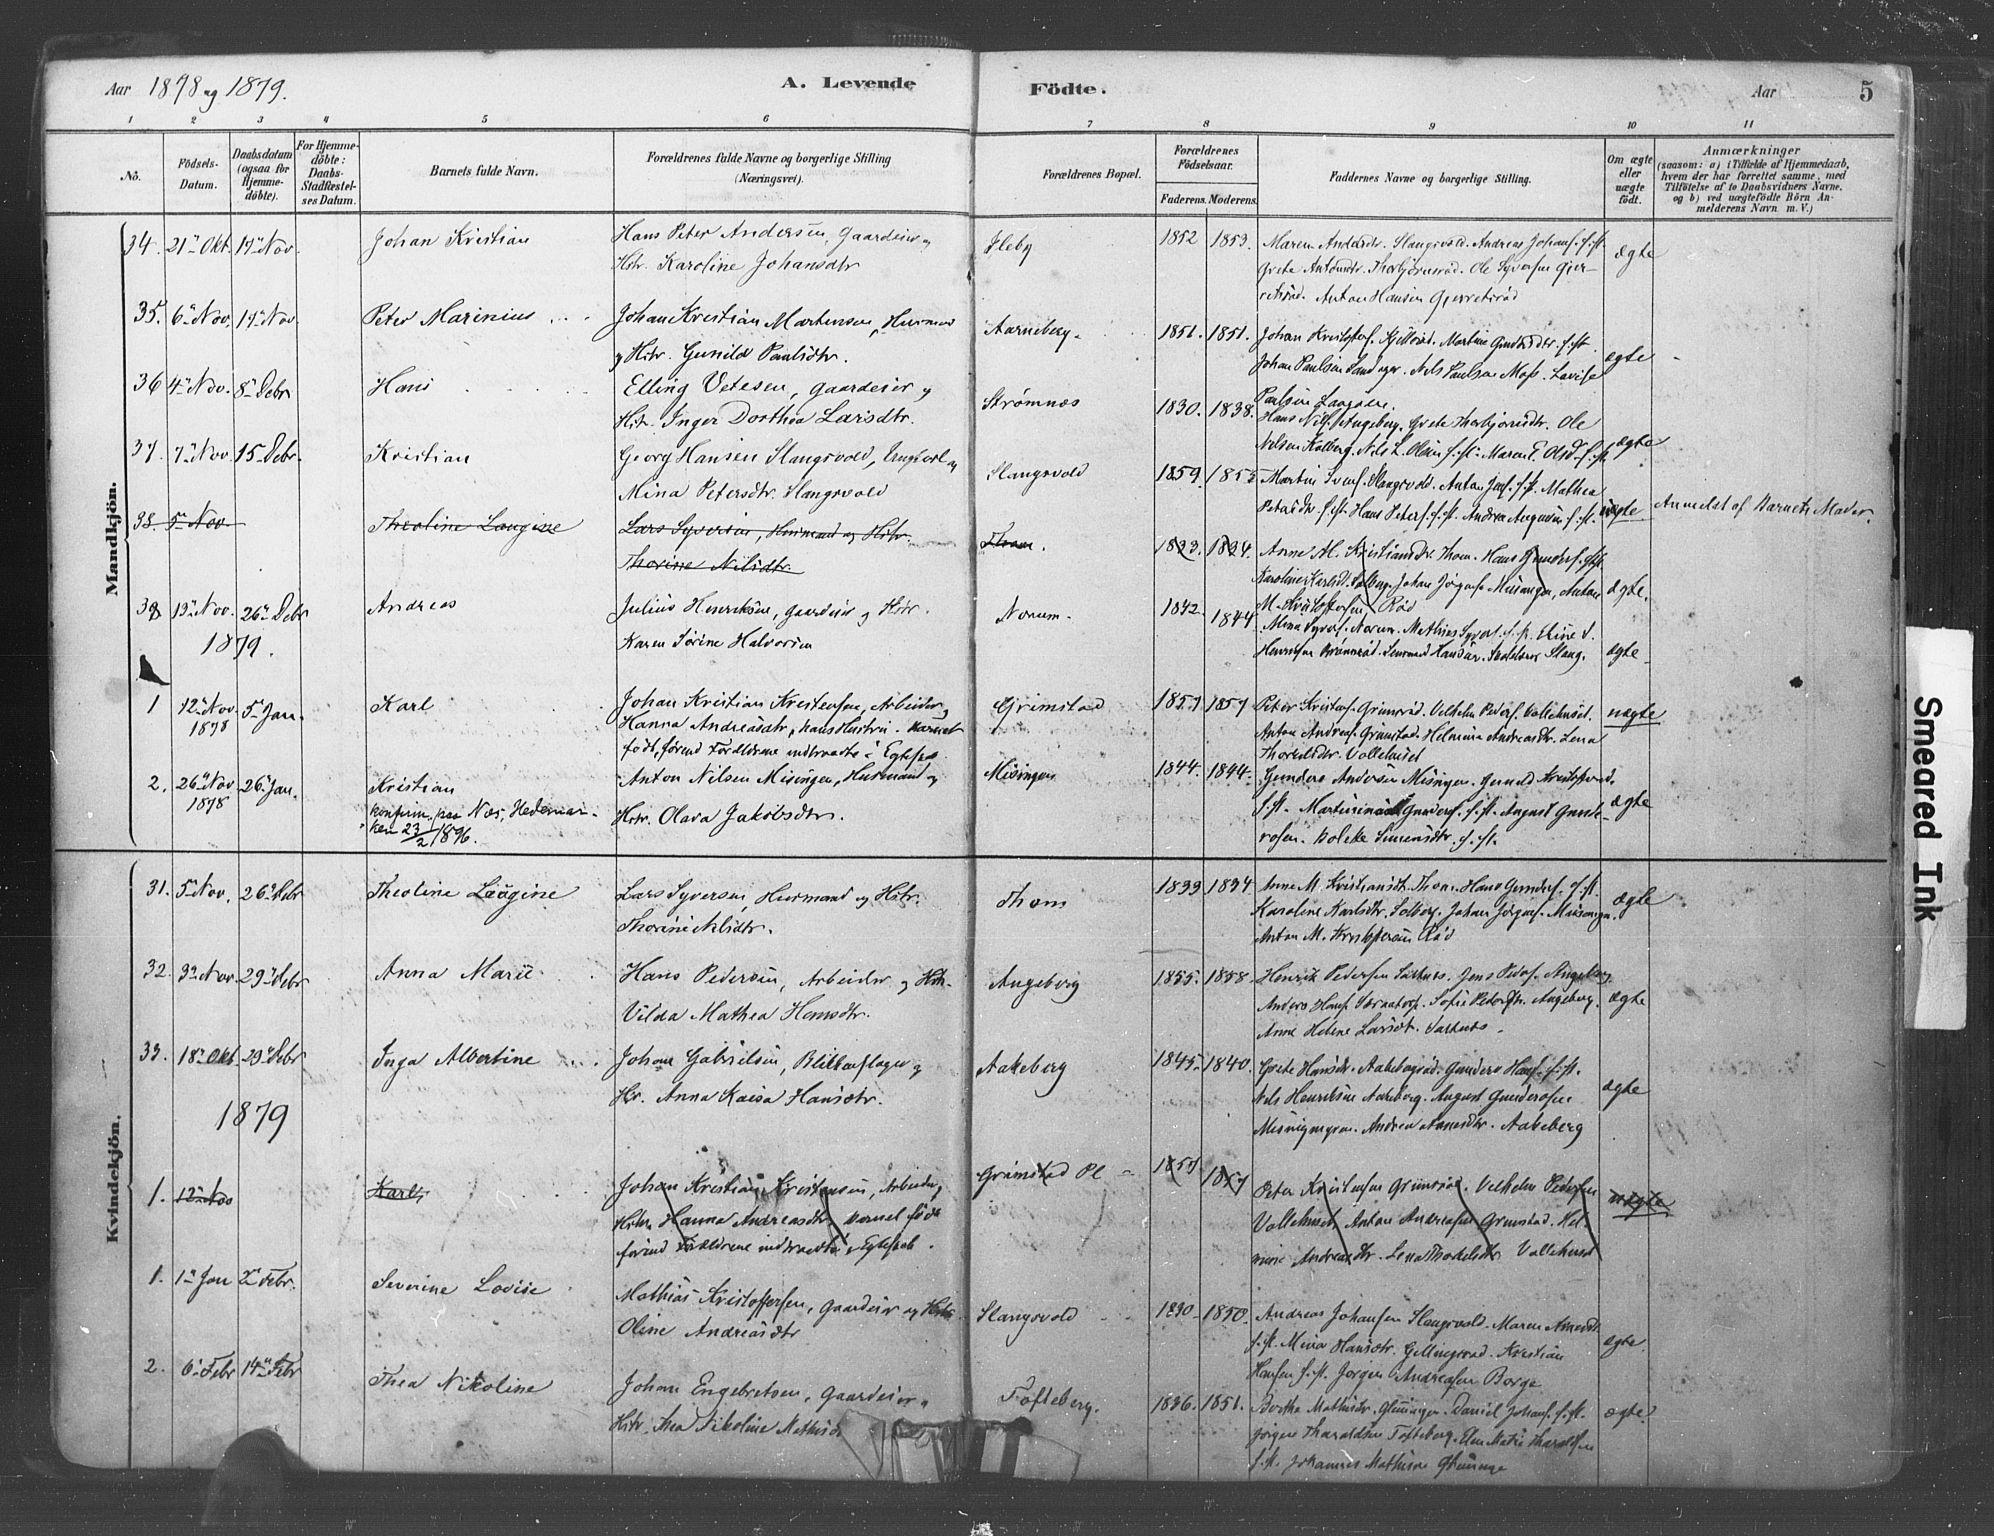 SAO, Råde prestekontor kirkebøker, F/Fa/L0007: Ministerialbok nr. 7, 1878-1902, s. 5